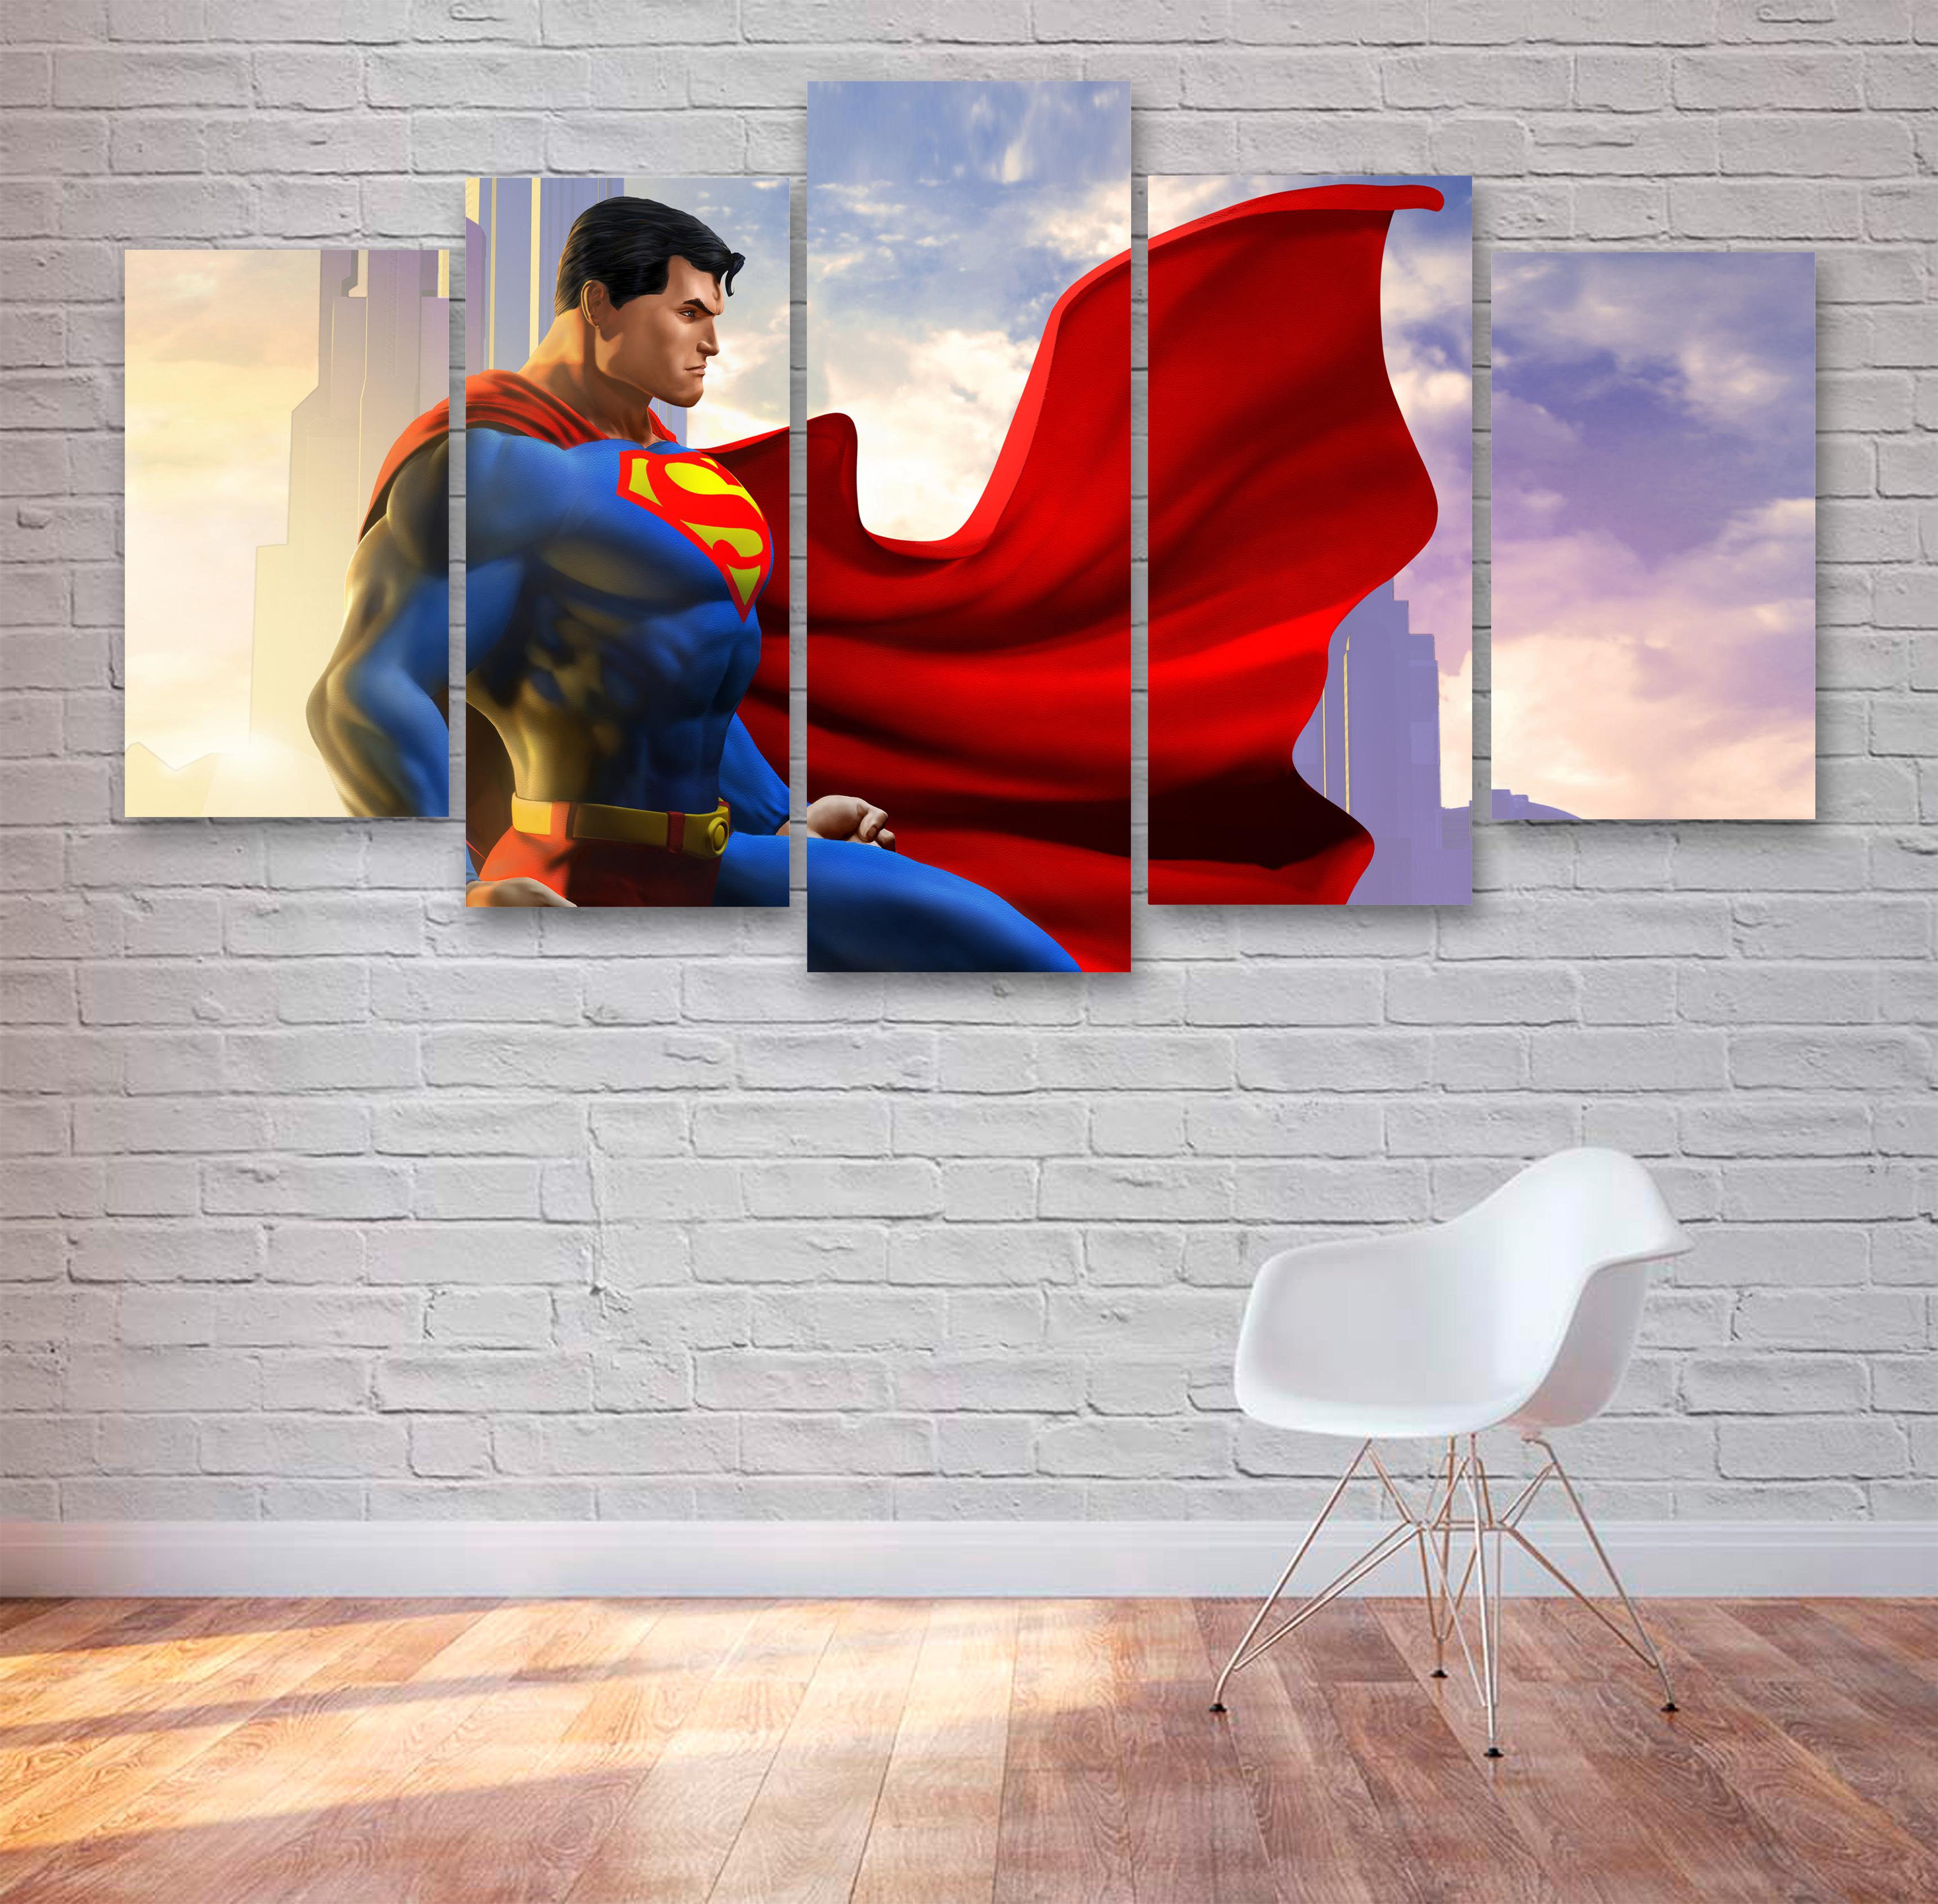 DC Superman Movie 5 Piece Canvas, Multi Panel Canvas, Home Decor, Bedroom  Decor, Office Decor 066 sold by PrintBoxGB